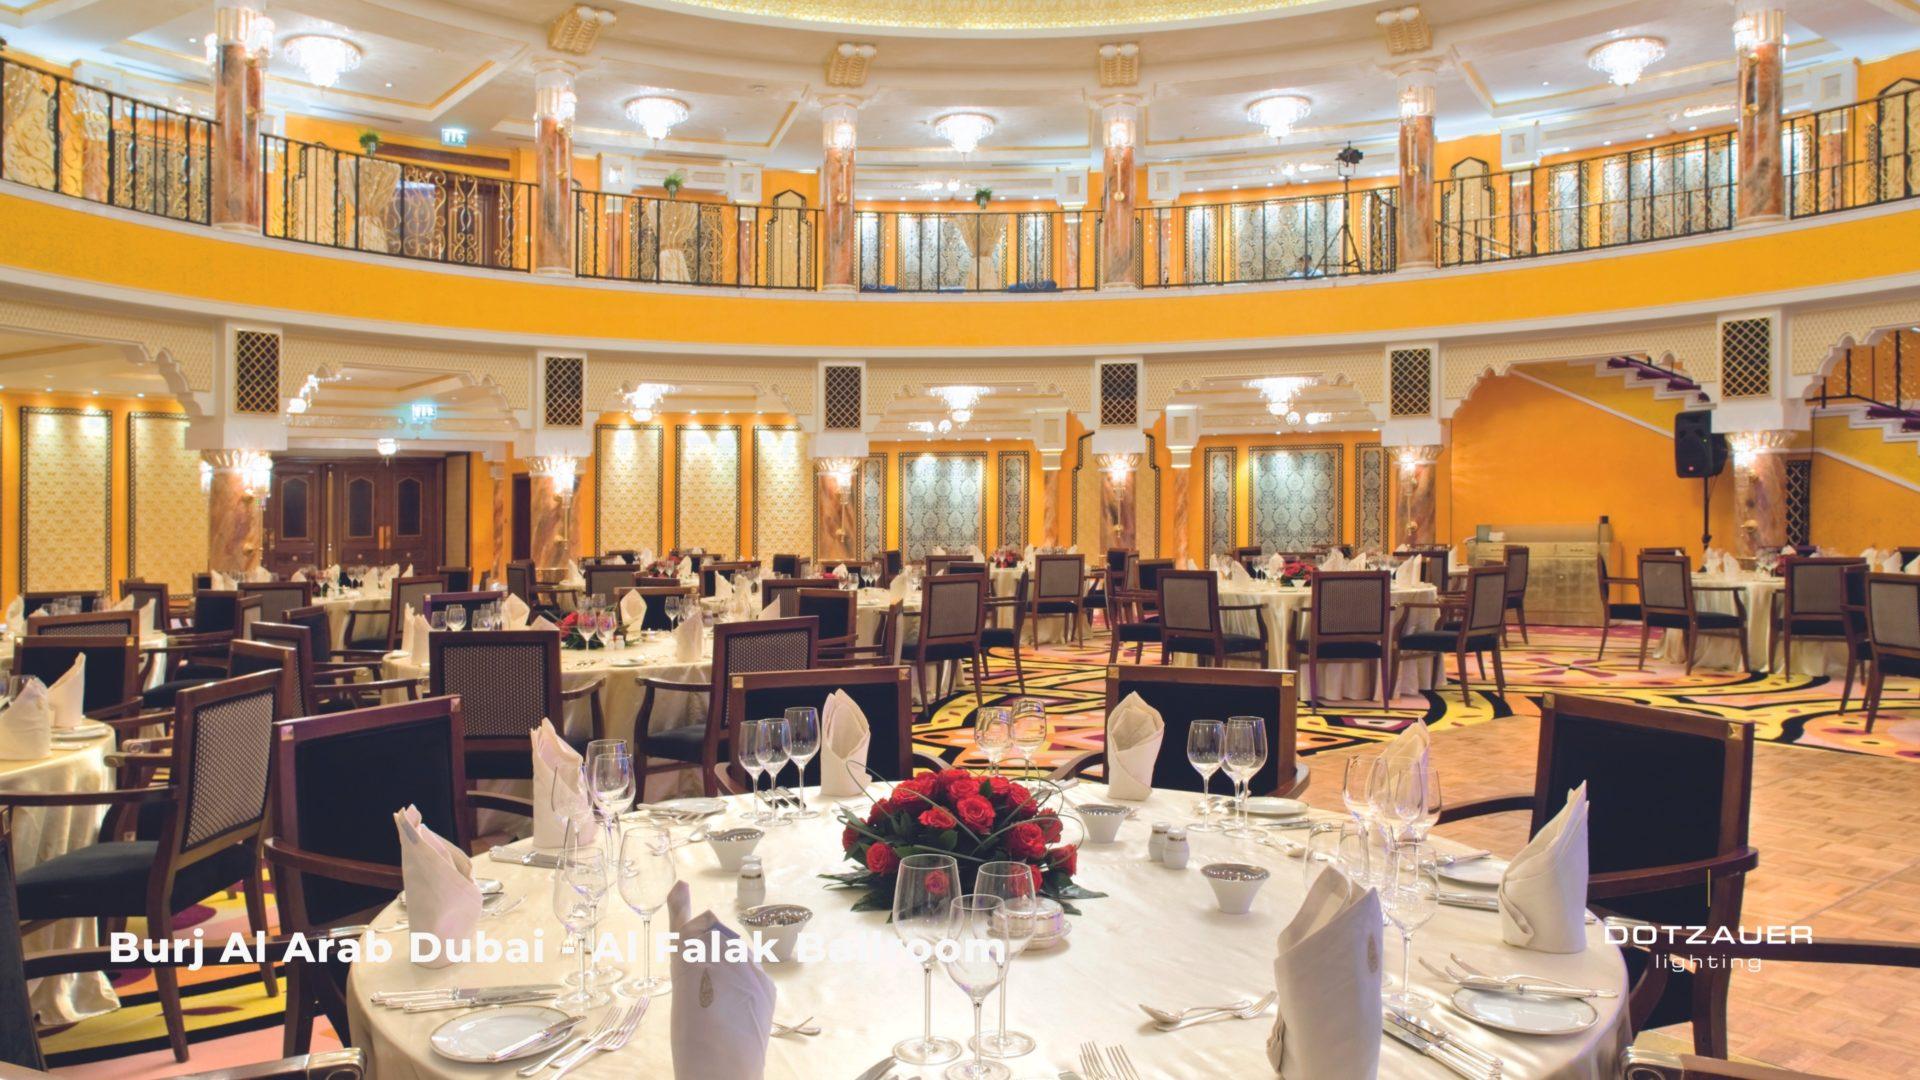 DOTZAUER - Luster im Burj Al Arab Hotel Dubai